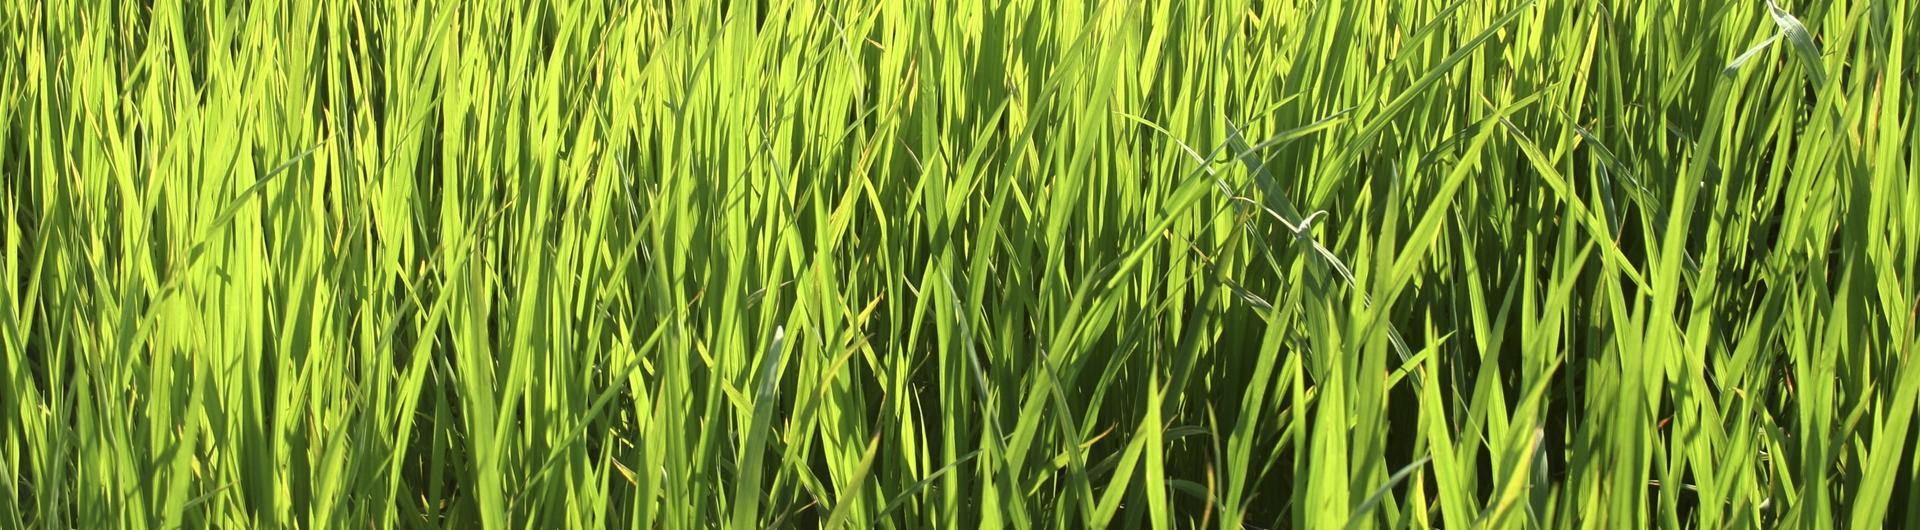 ABC Rice